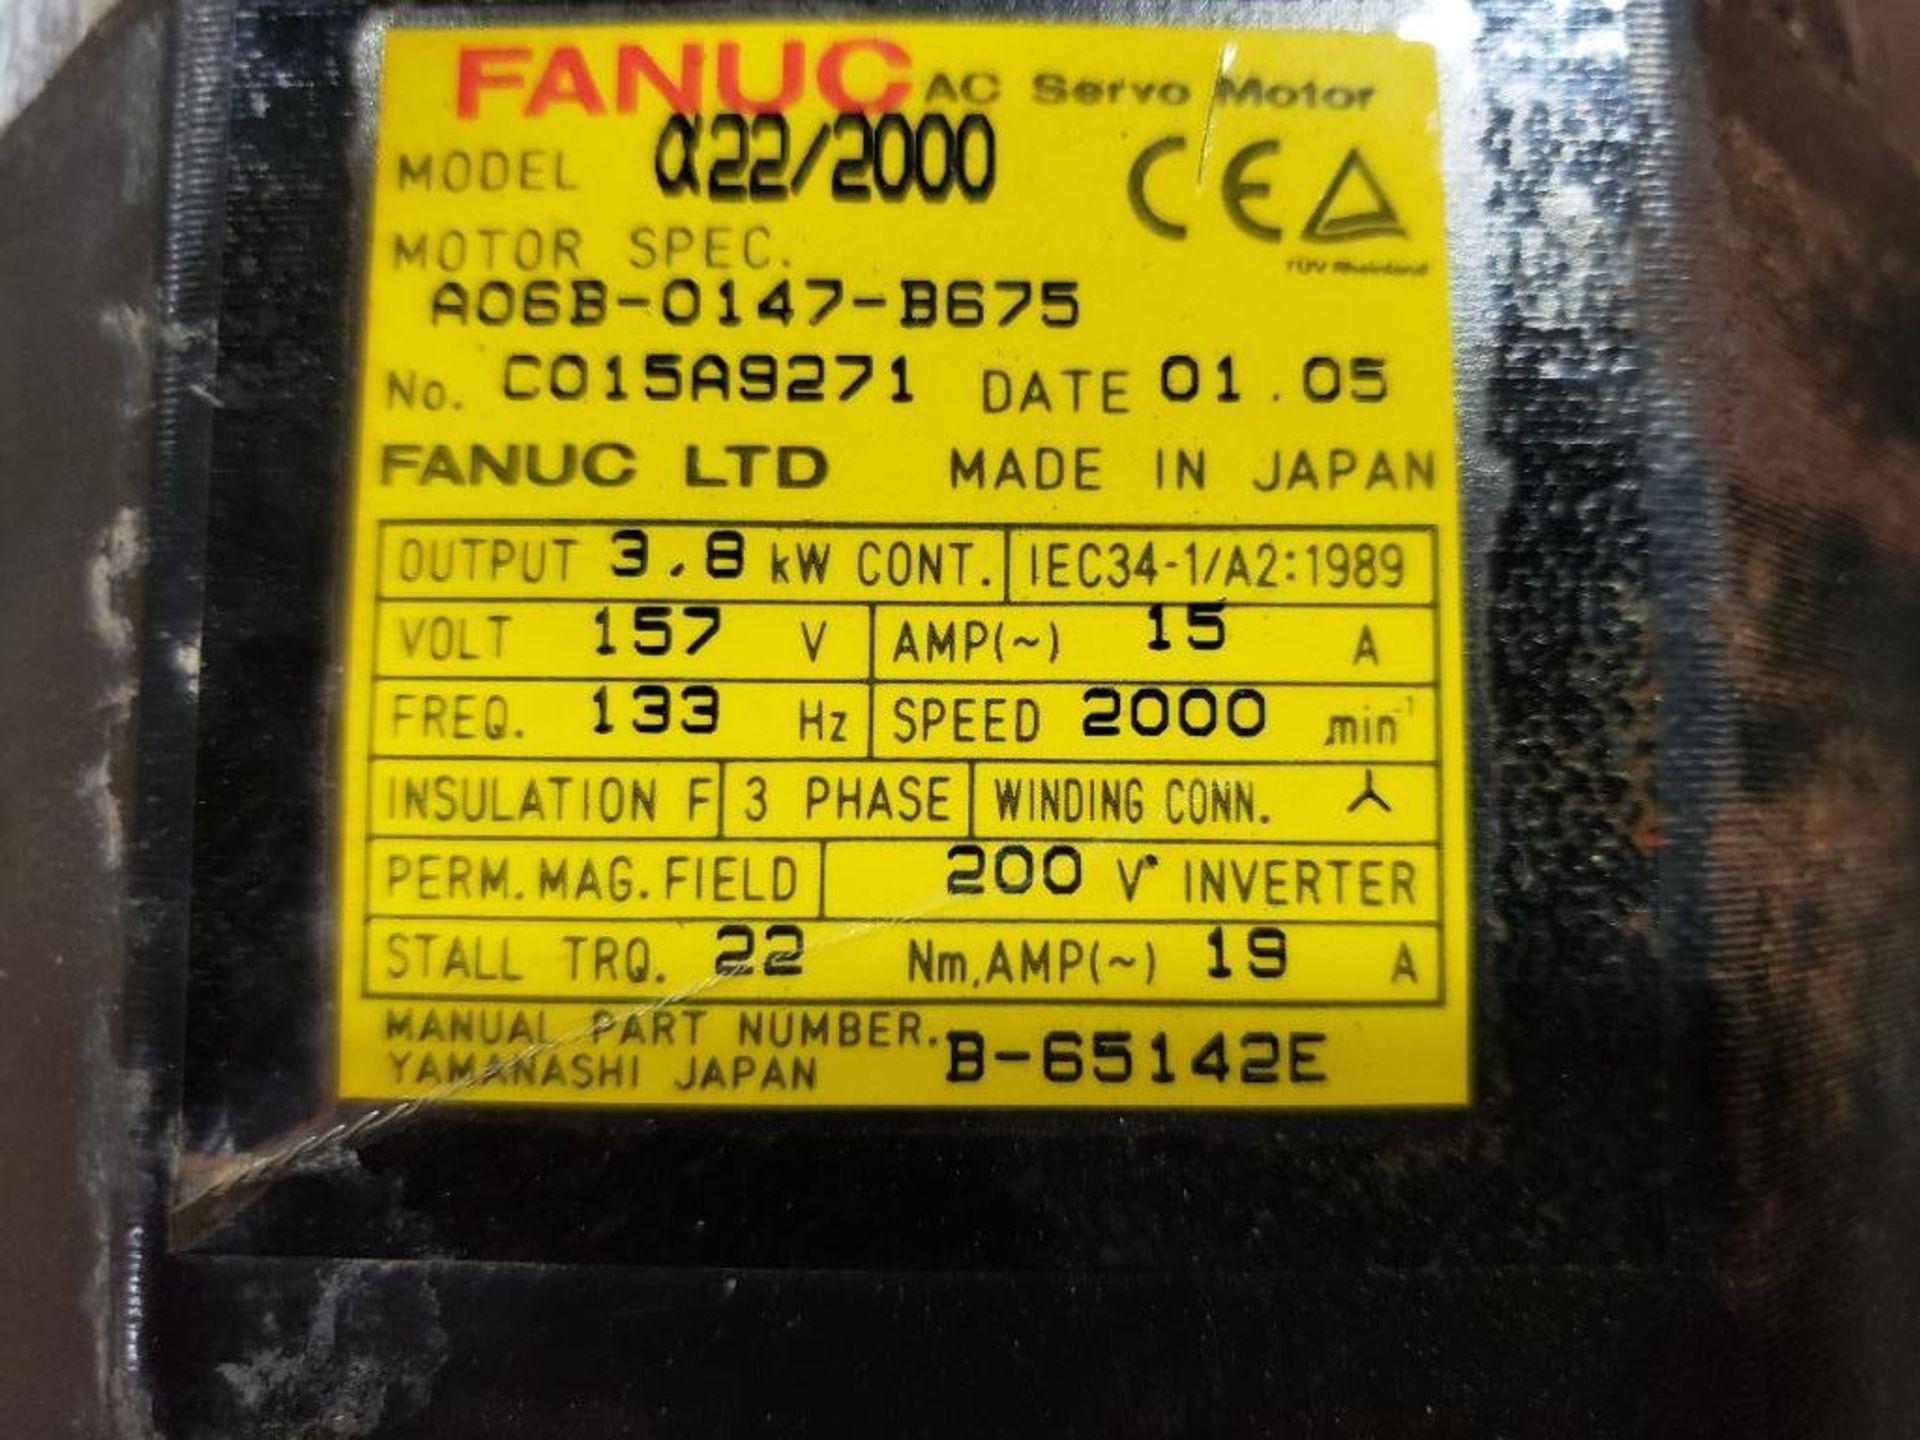 3.8kW GE Fanuc AC Servo Motor A06B-0147-B675. 157V, 2000RPM, 3PH. - Image 2 of 5